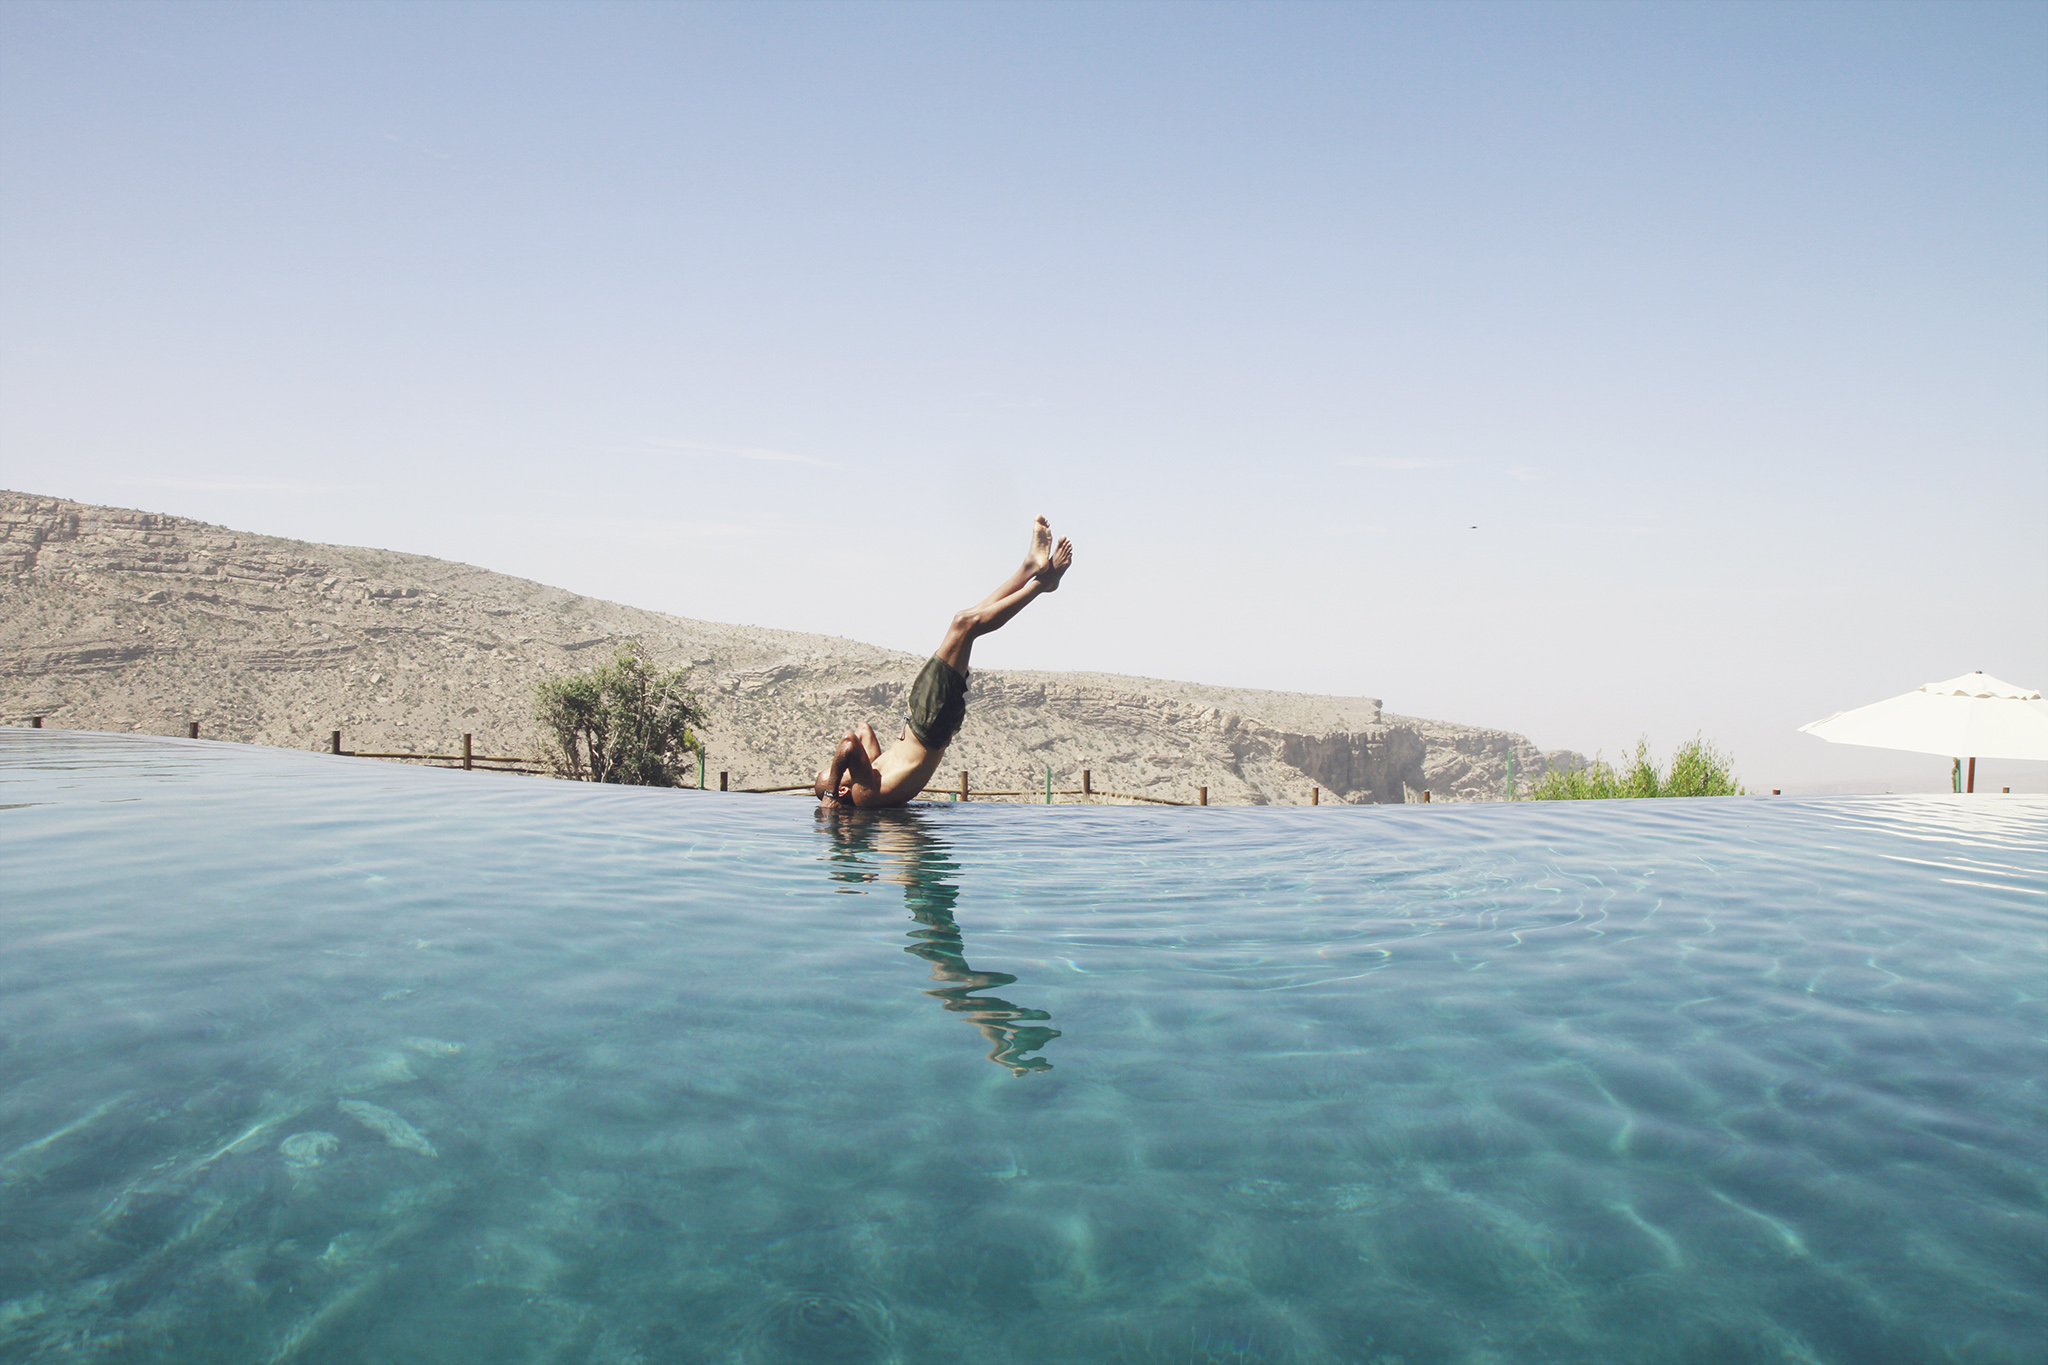 2017-04-Alila-Jabal-Akhdar - alila-jabal-akhdar-oman-nectarandpulse-pool-17.jpg